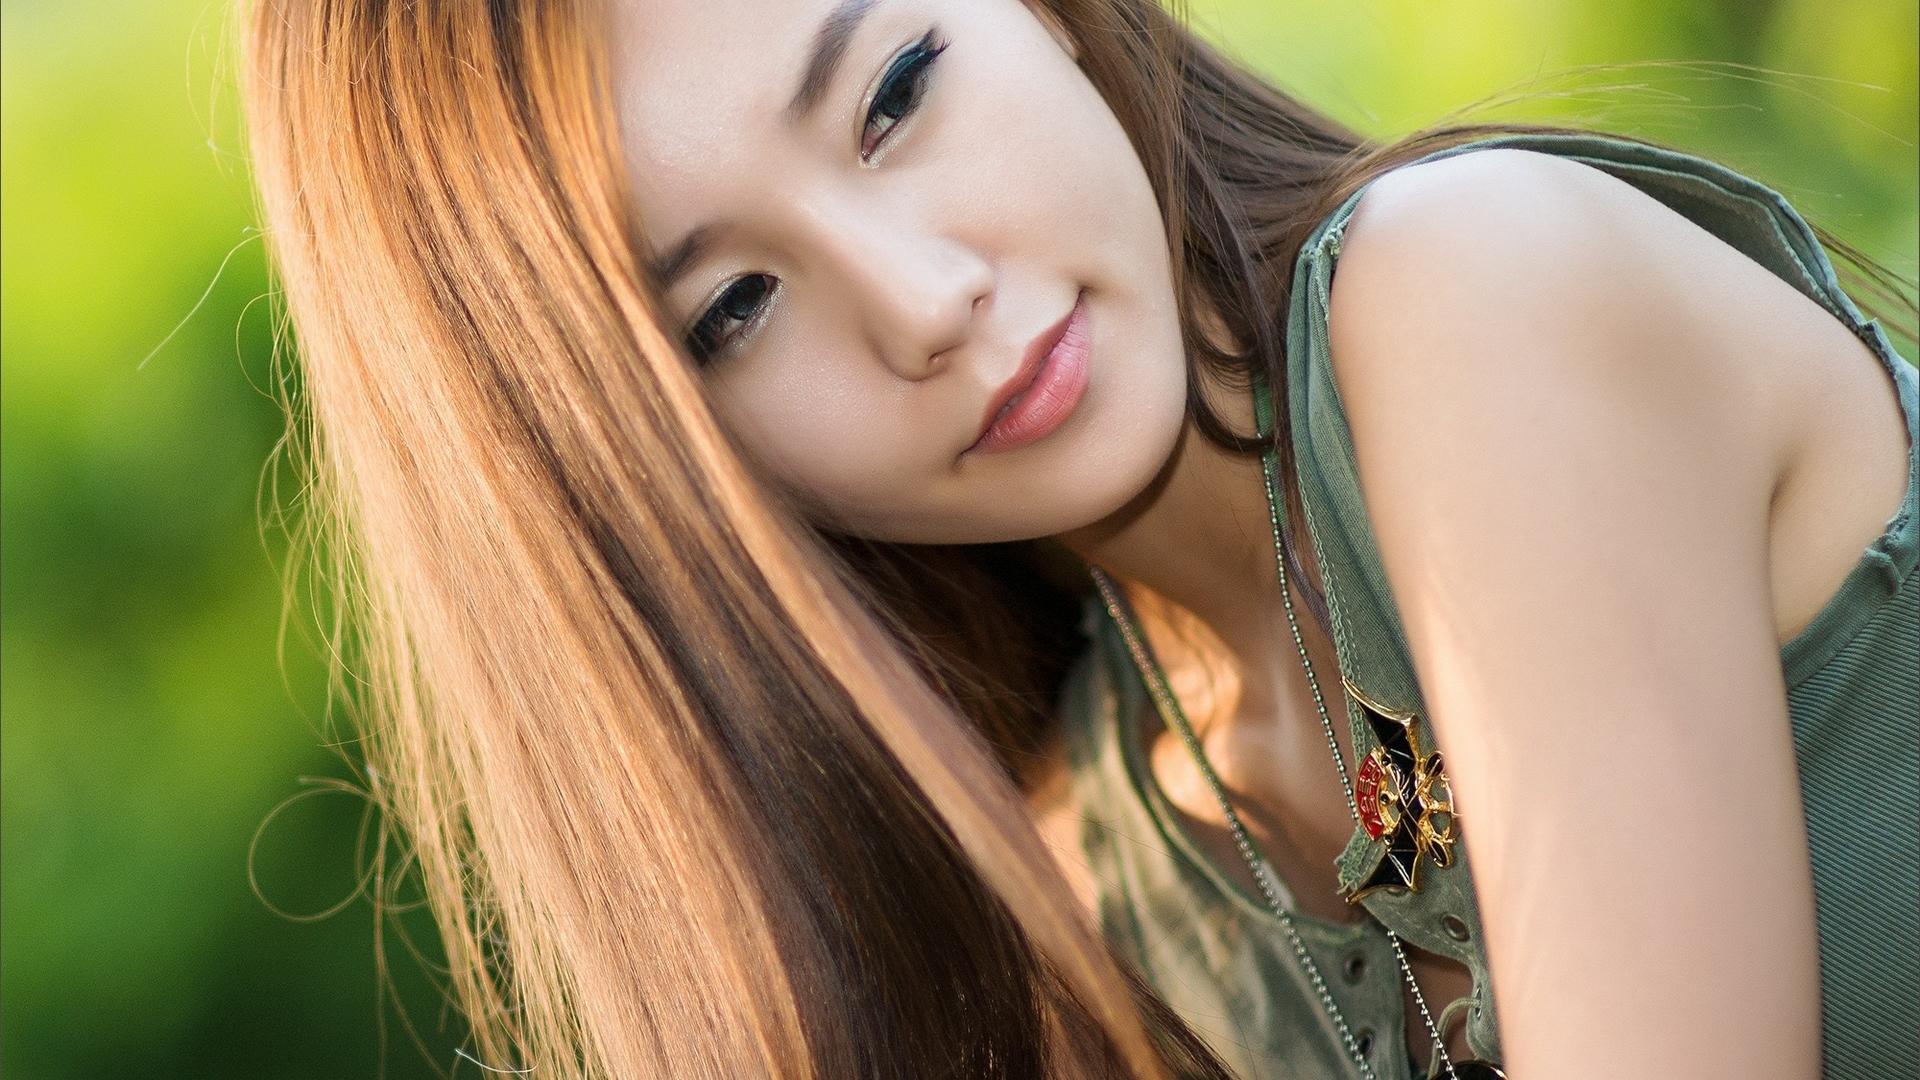 Korean Girl Full Hd Wallpaper Lee Ji Min Full Hd Wallpaper And Background Image